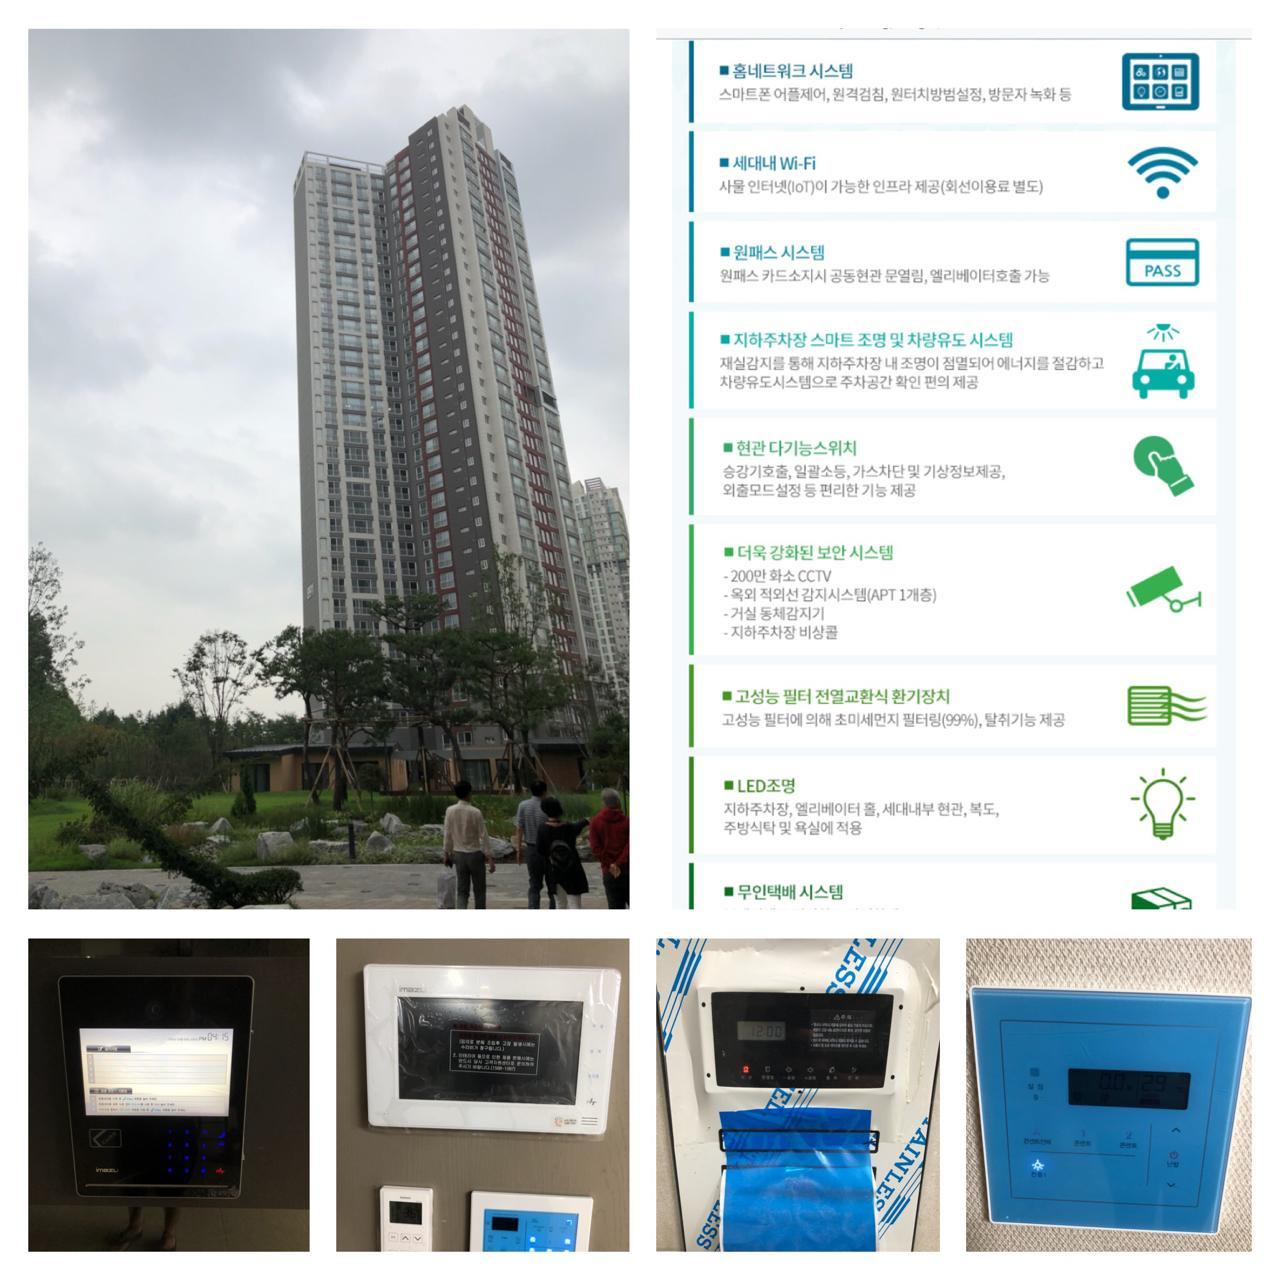 Smart home in South Korea